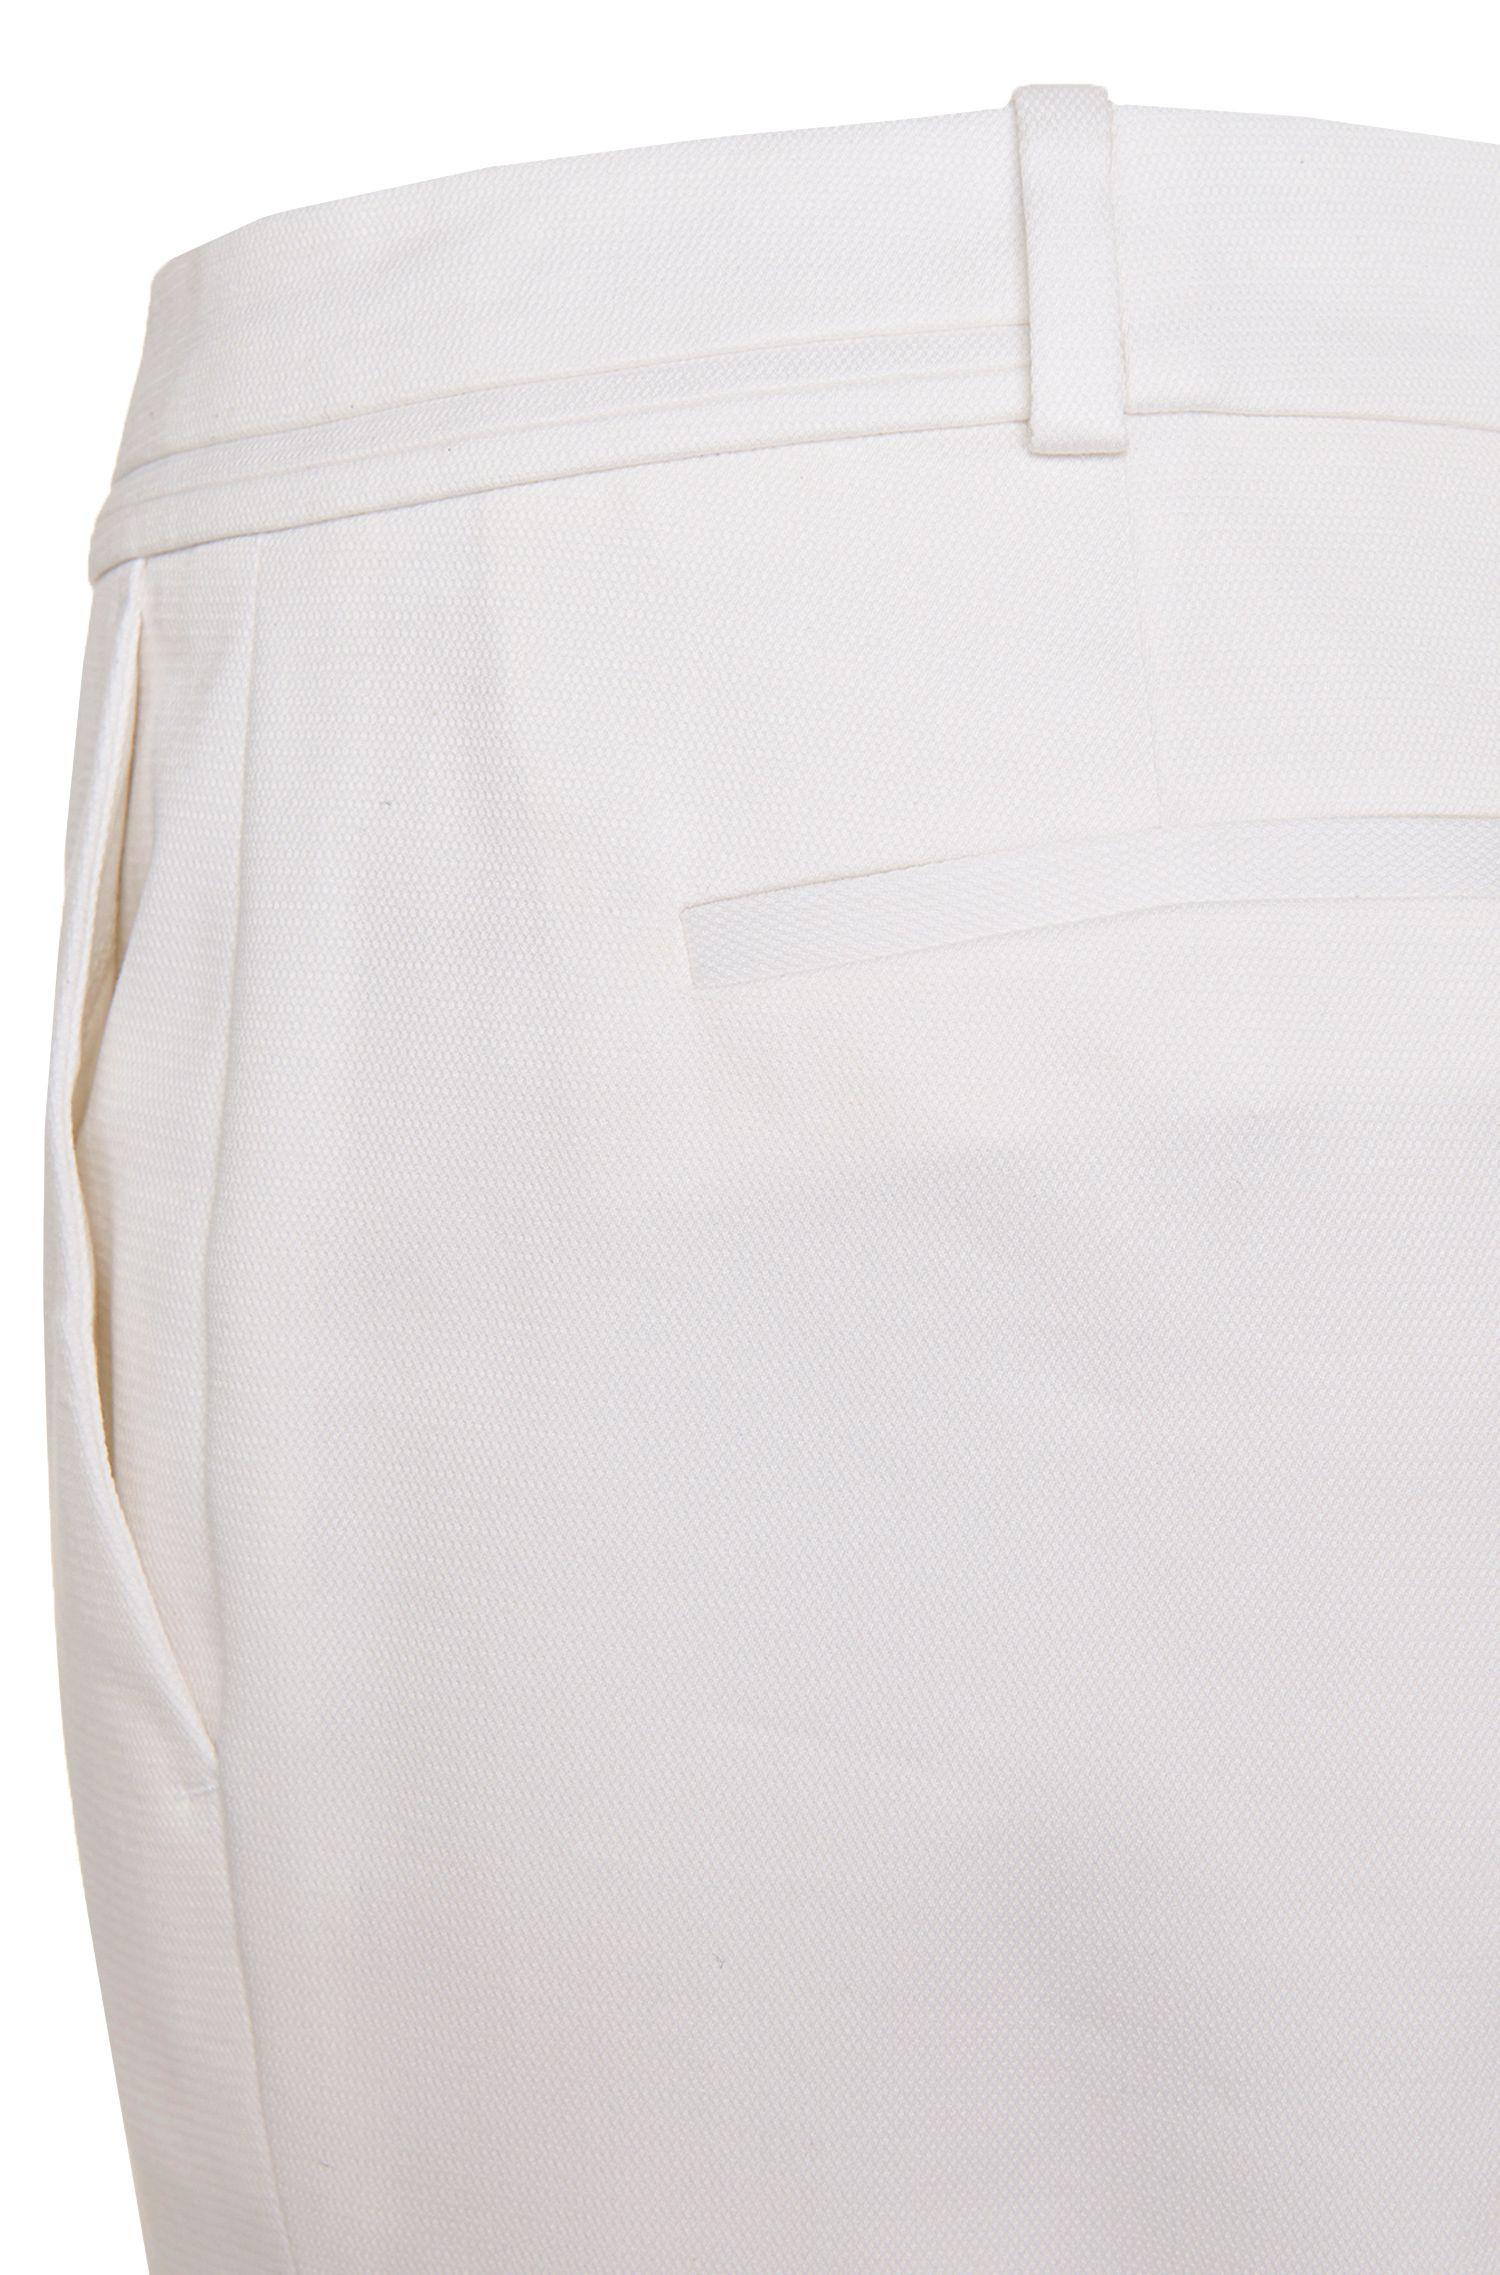 Regular-Fit Hose aus Baumwoll-Mix: 'Tanare2'